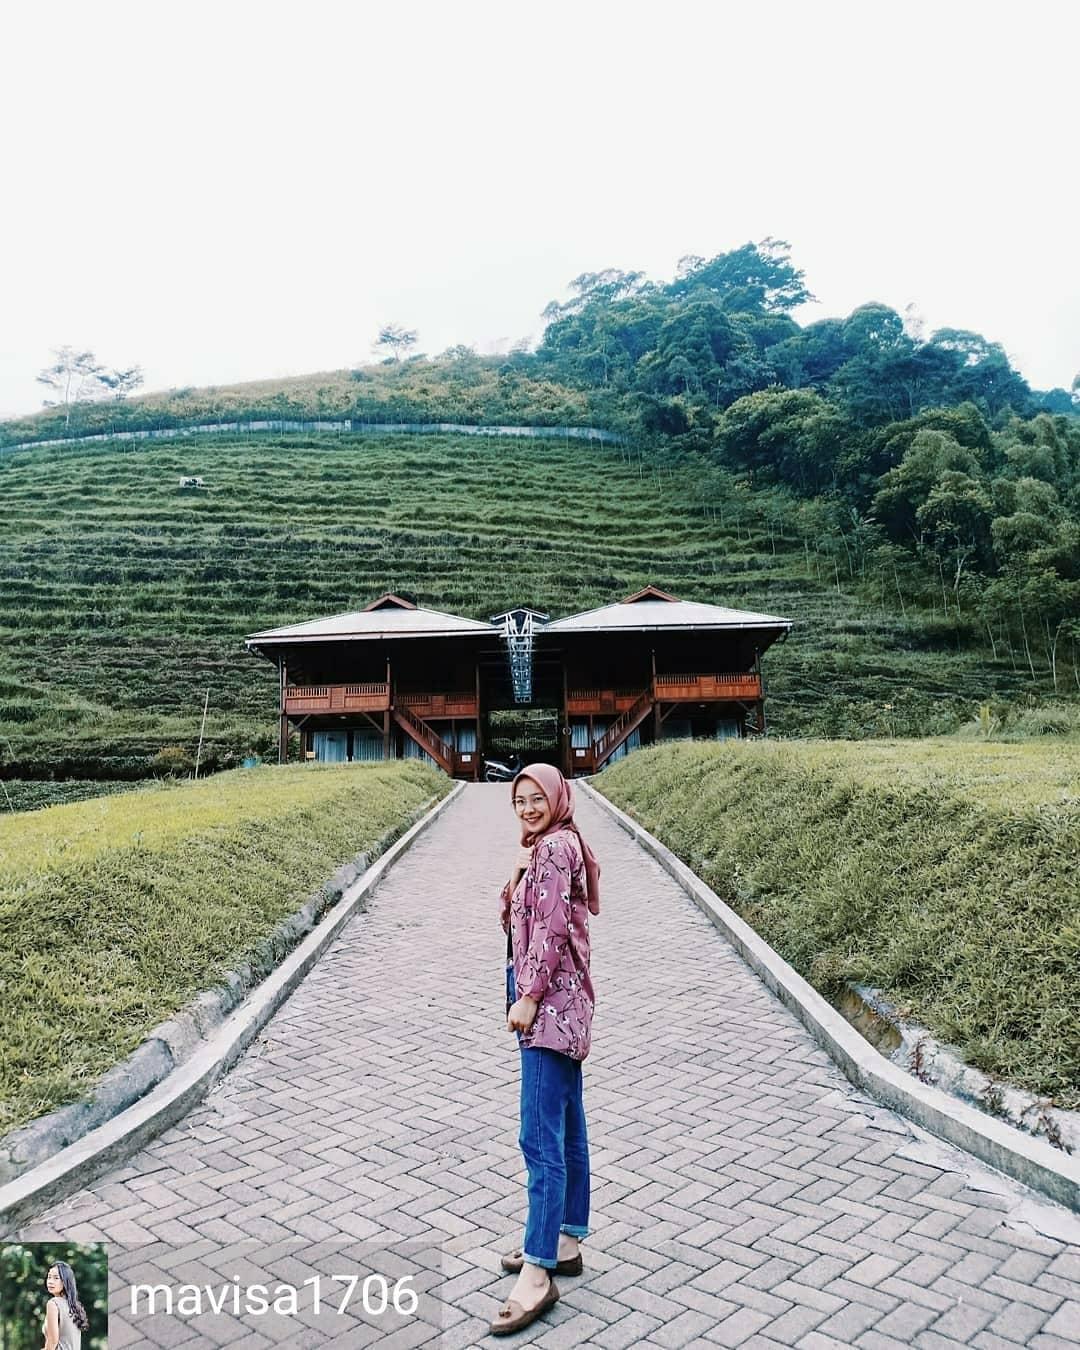 Tiket Masuk Gunung Kawi Malang 2020 Asal Usul Pesugihan Dan Makam